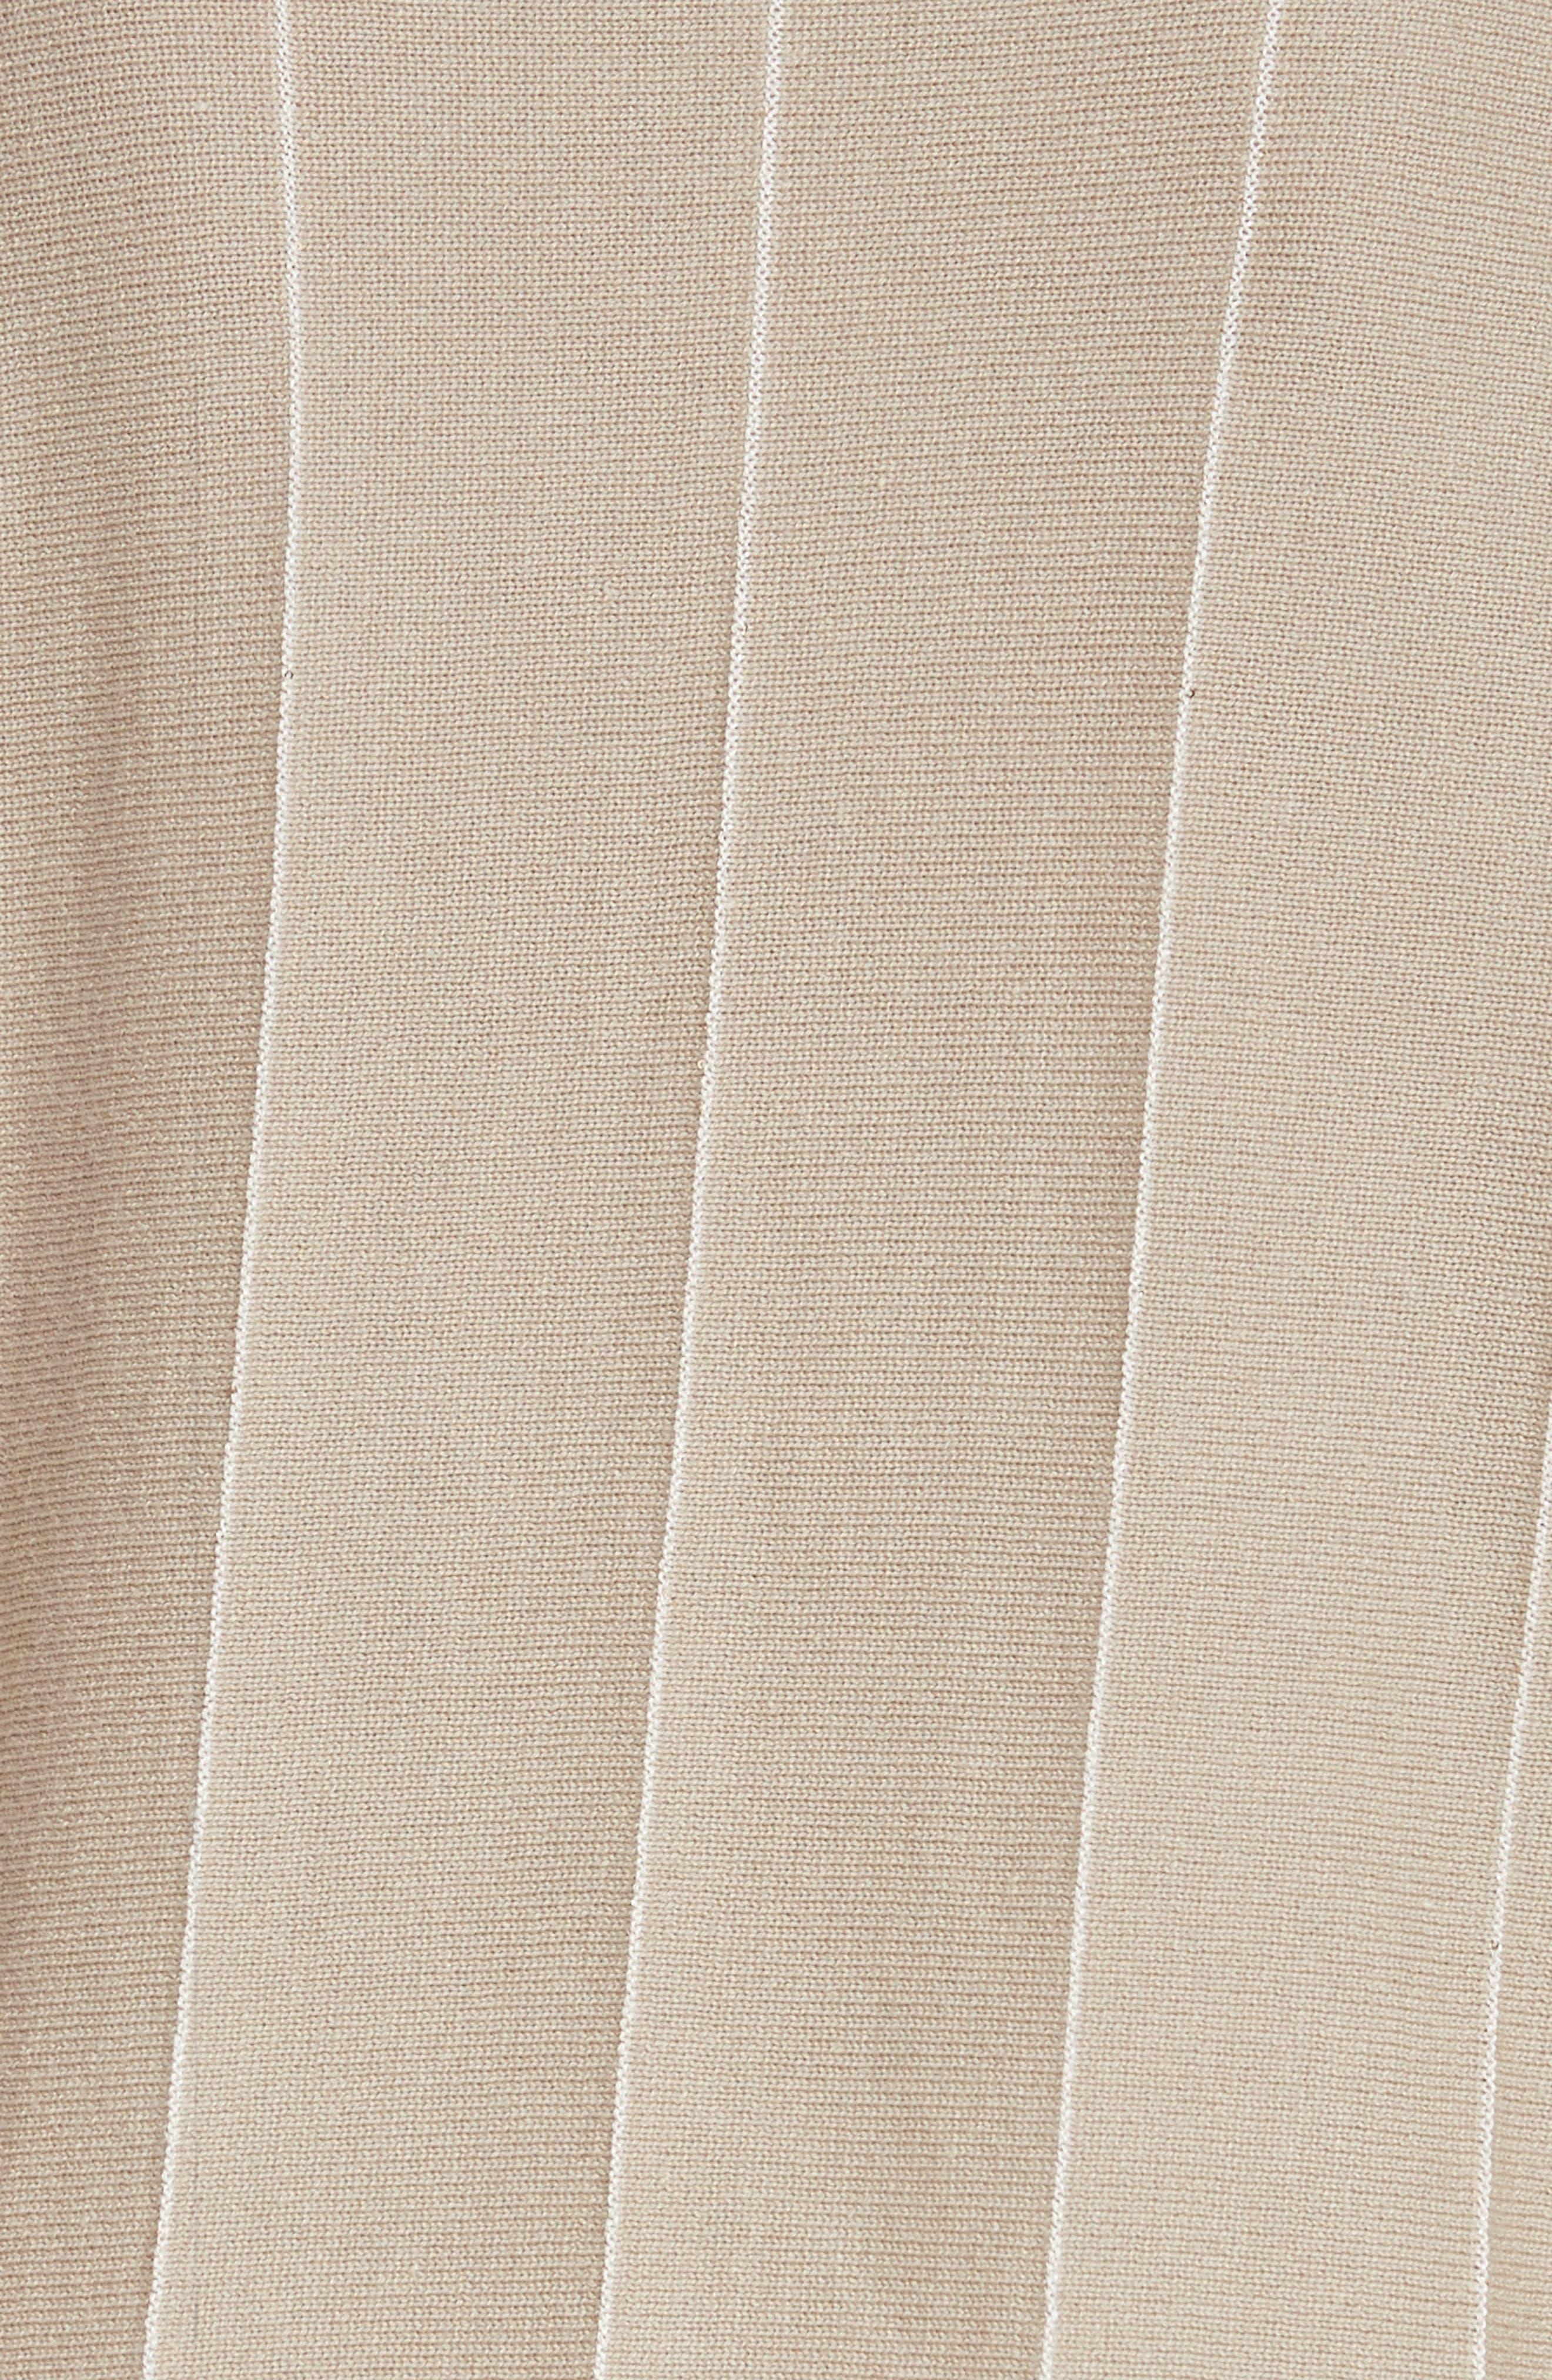 Sequin Knit Cashmere & Silk Pullover,                             Alternate thumbnail 5, color,                             Khaki Multi